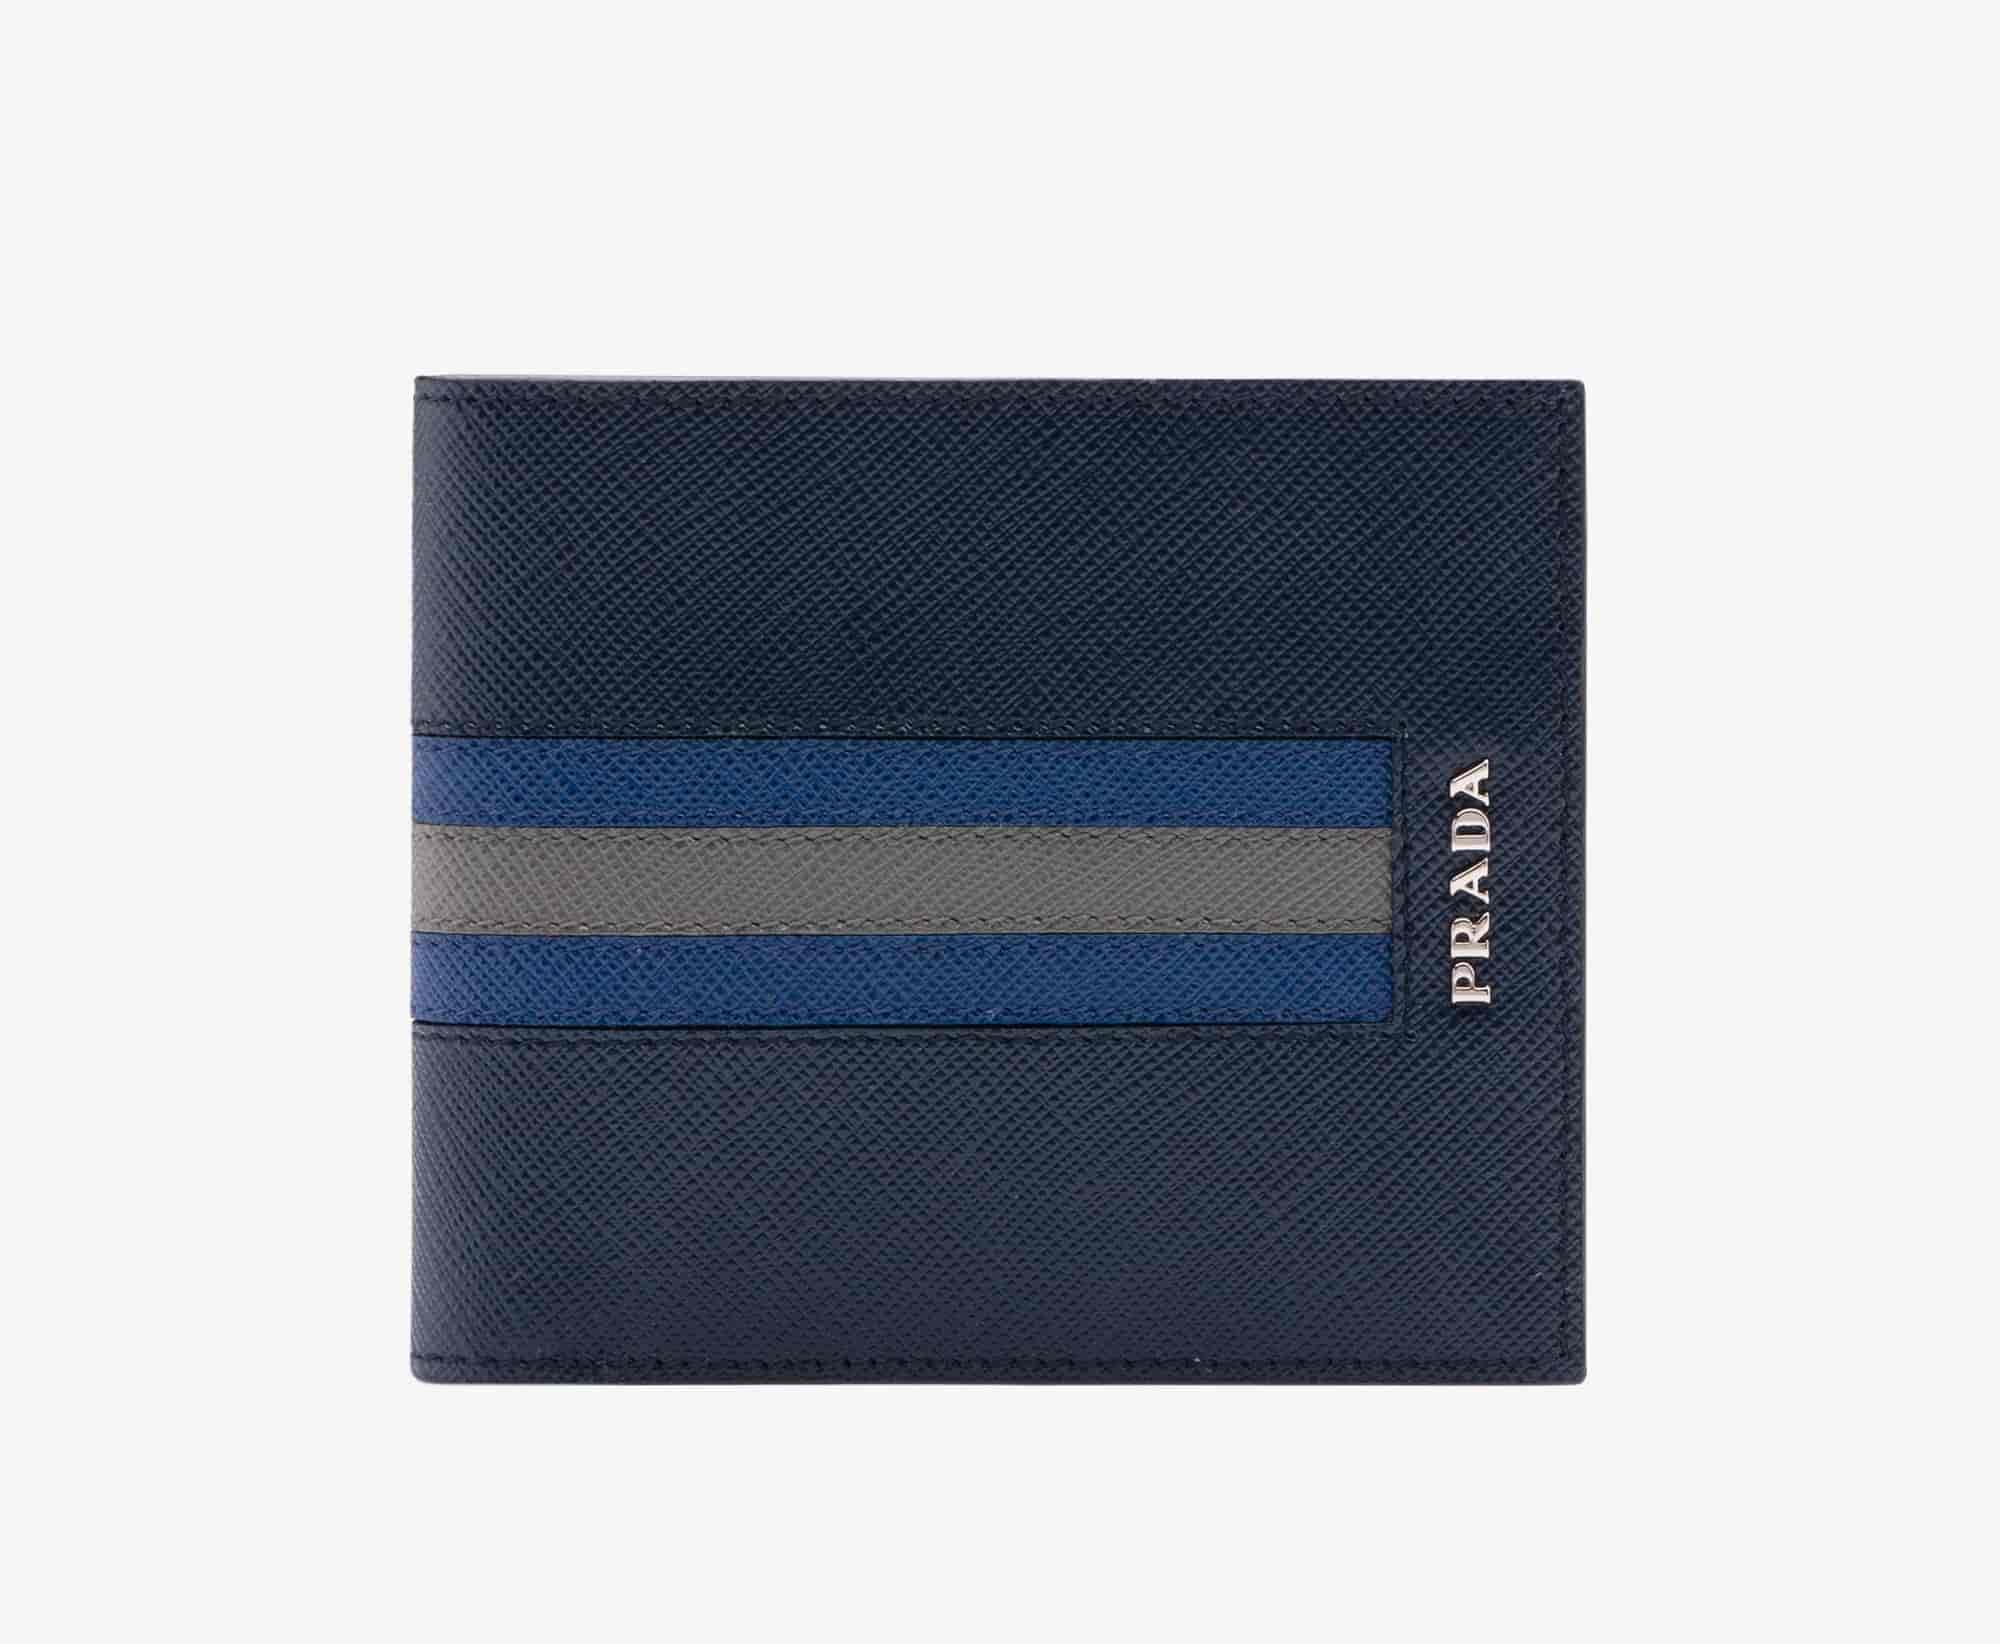 Prada Mens Wallets Online Prada Handbag Orange